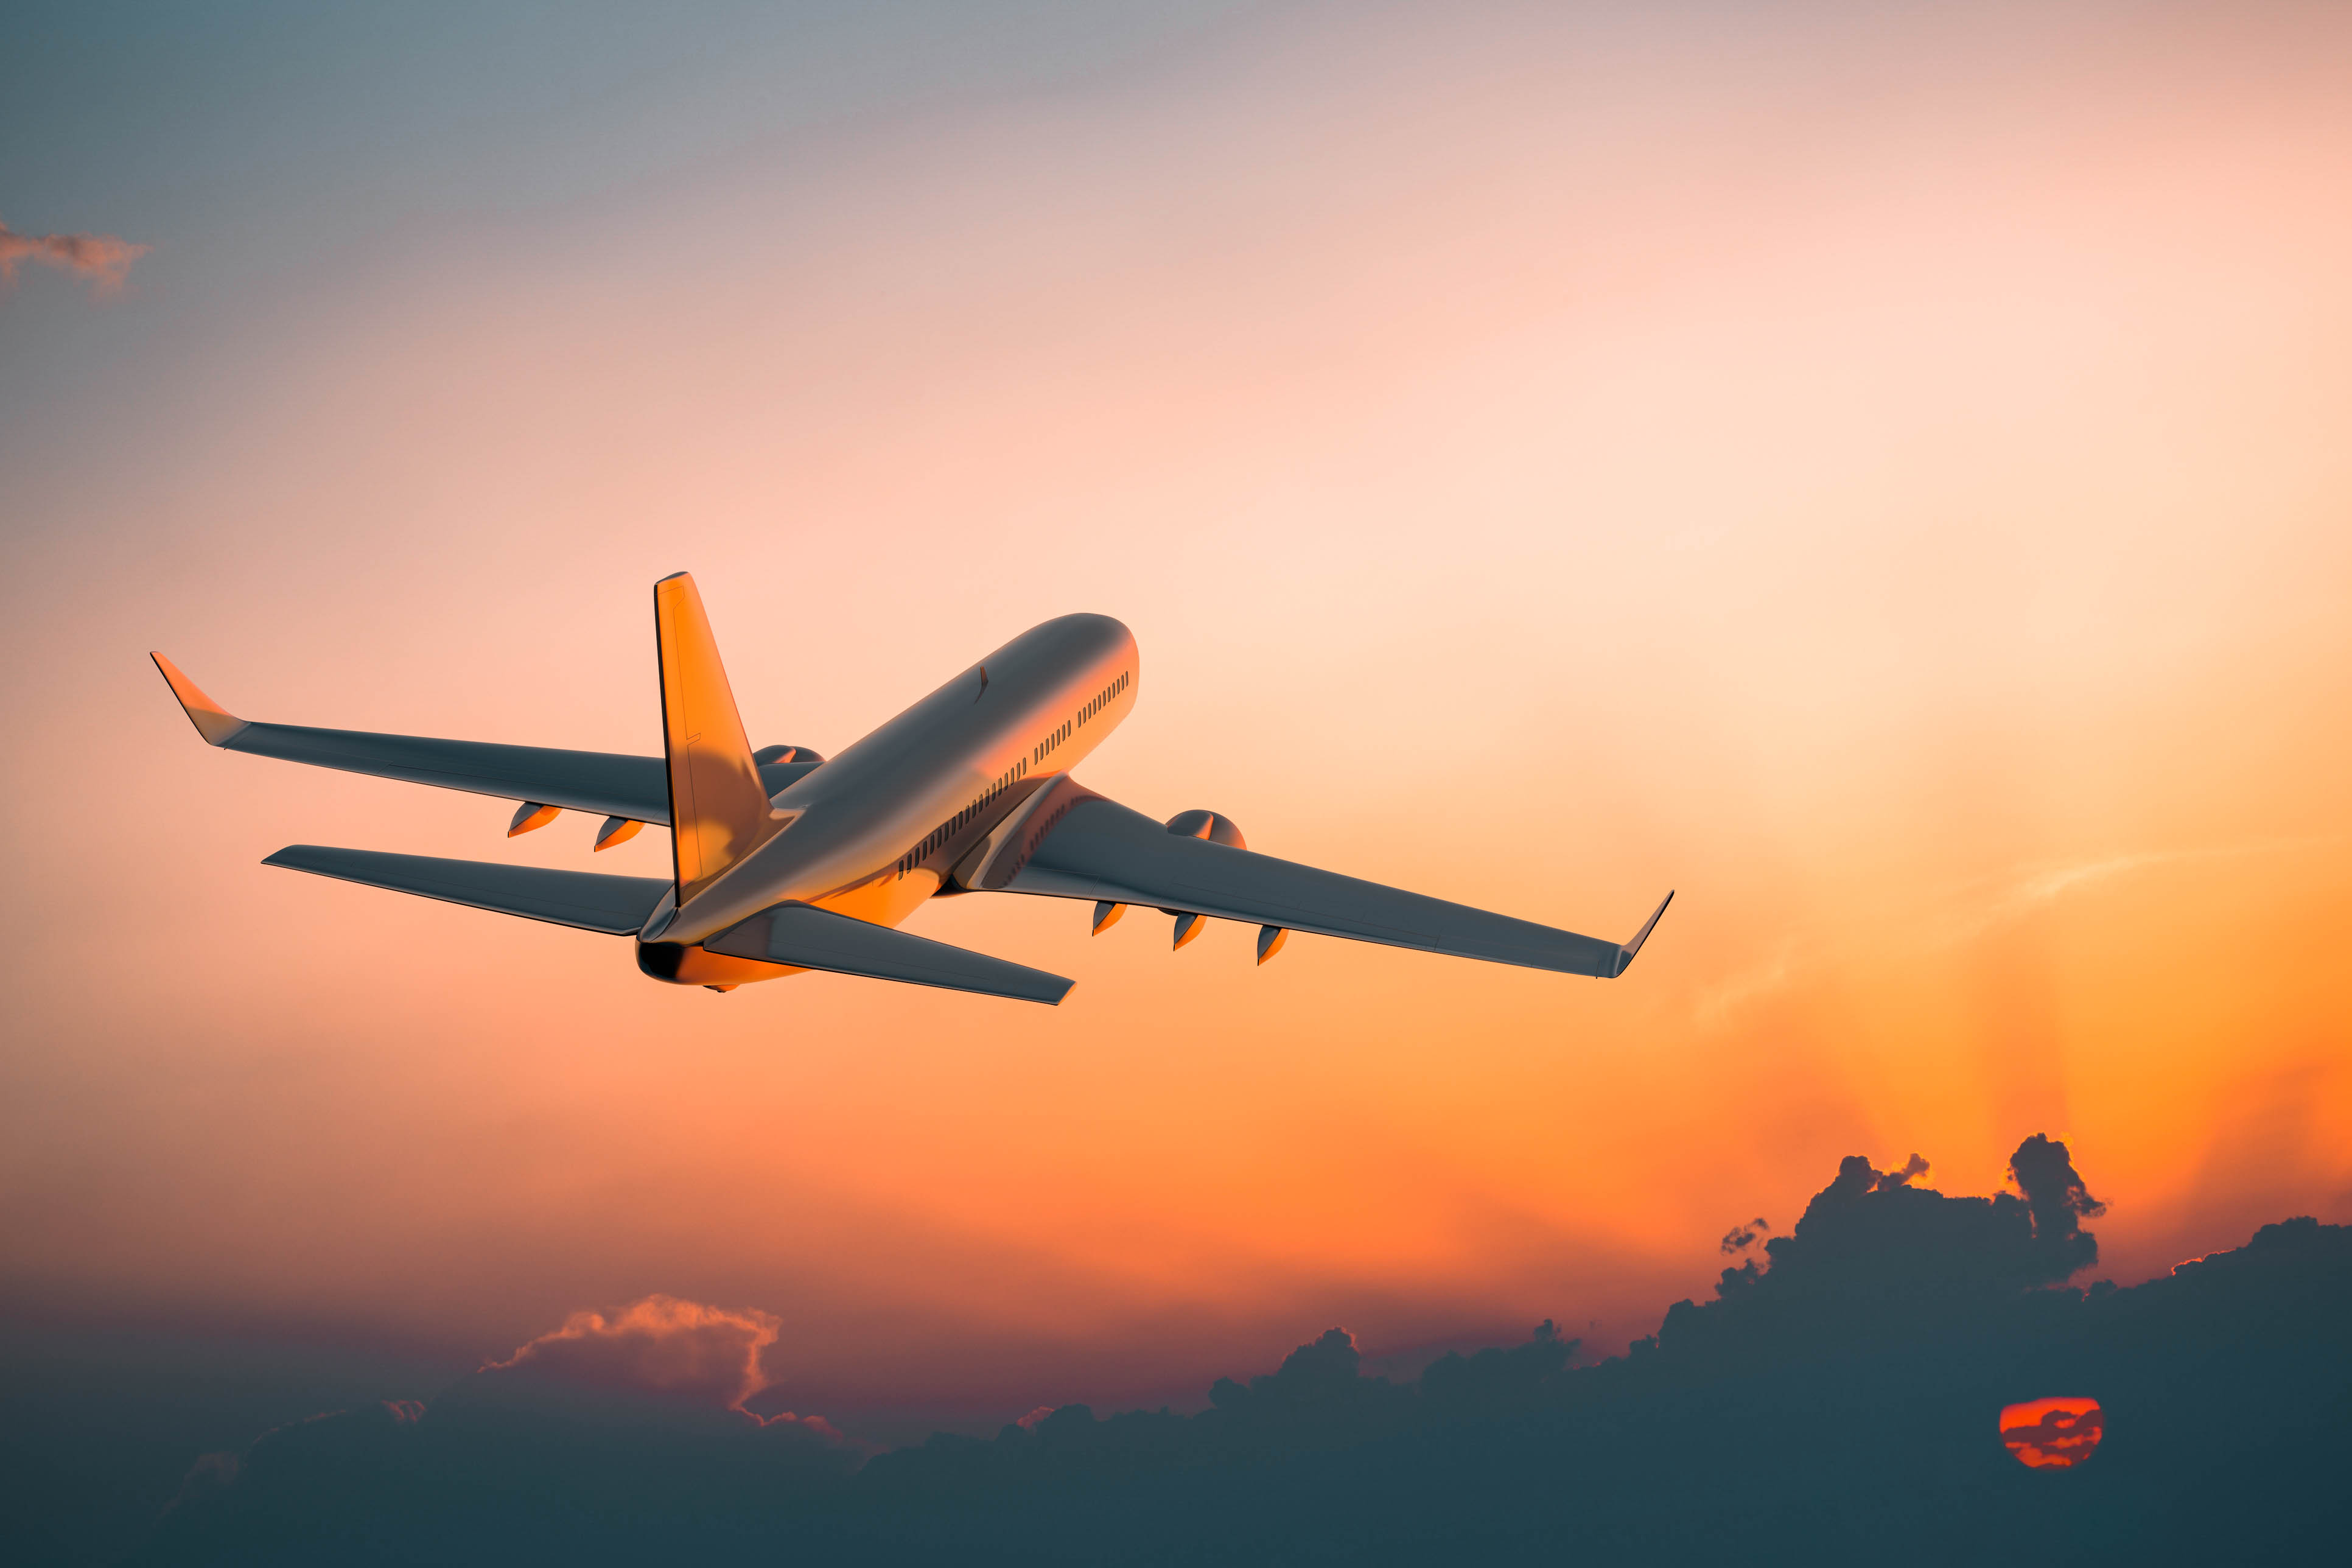 hangar a digital air cargo logistics platform marketplace same-day next-day cargo freight services united states